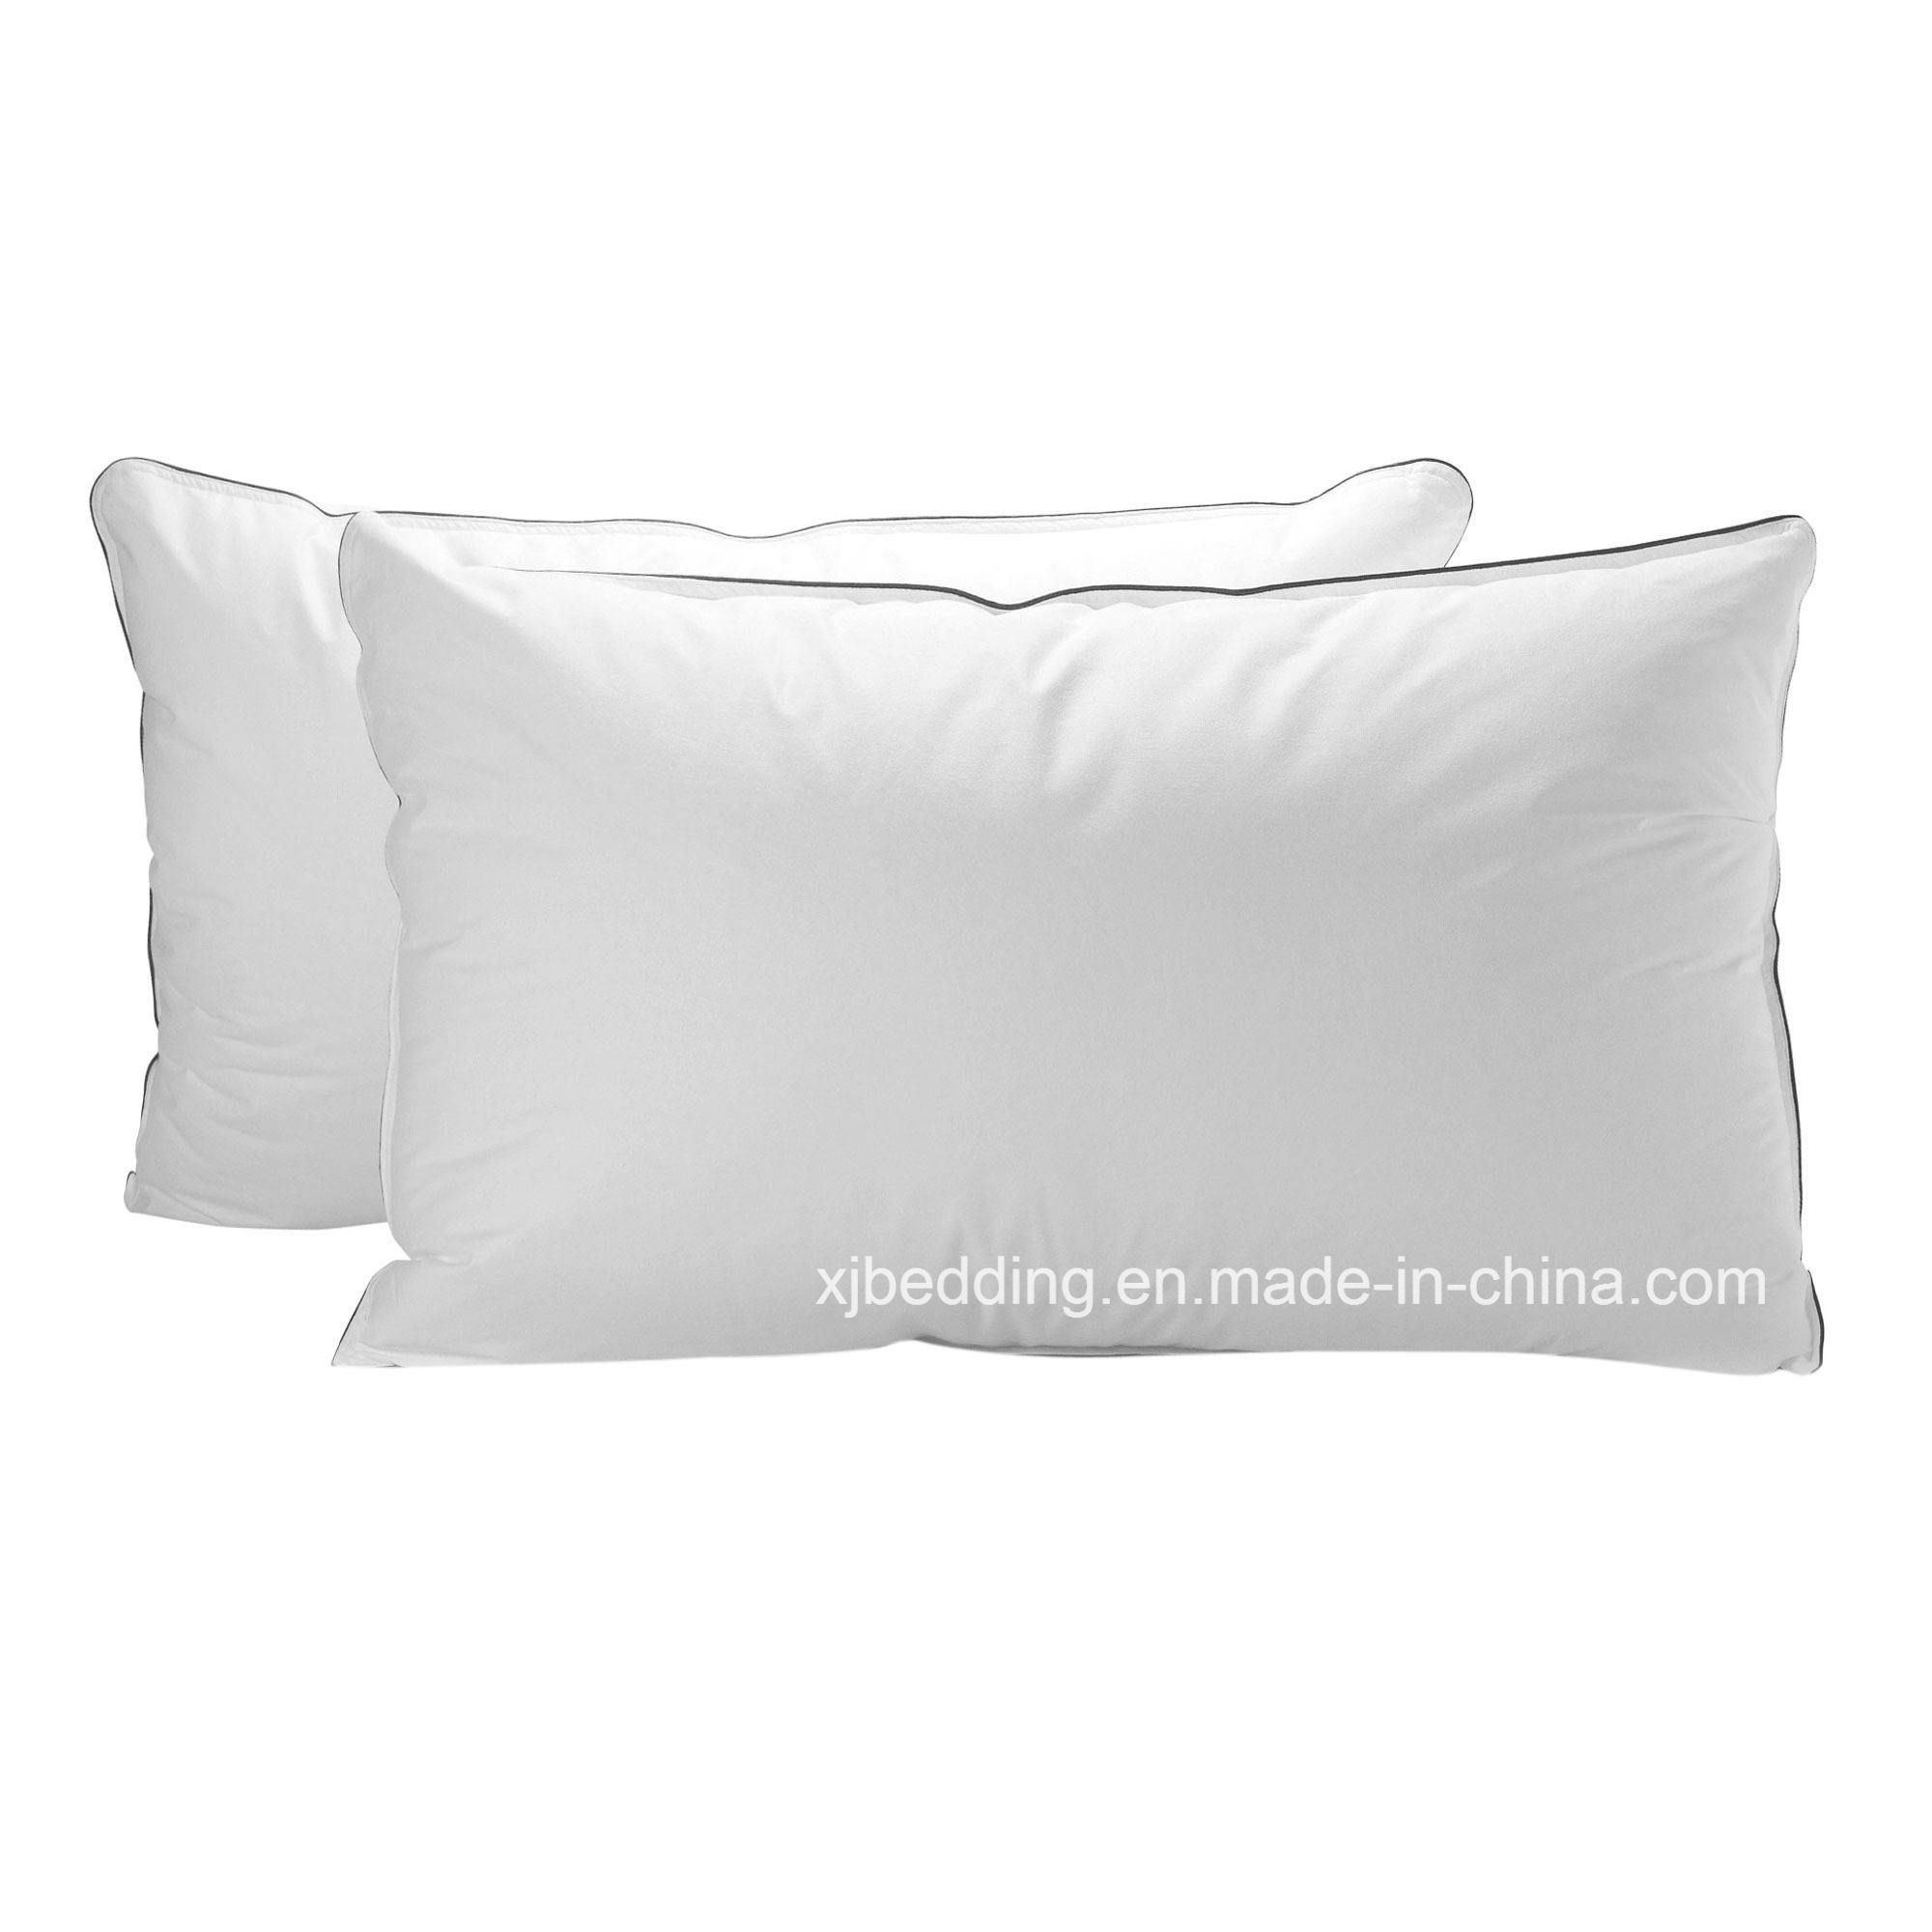 Cotton Fabric Microfiber Pillow Box Pillow with 2.5cm Gusset